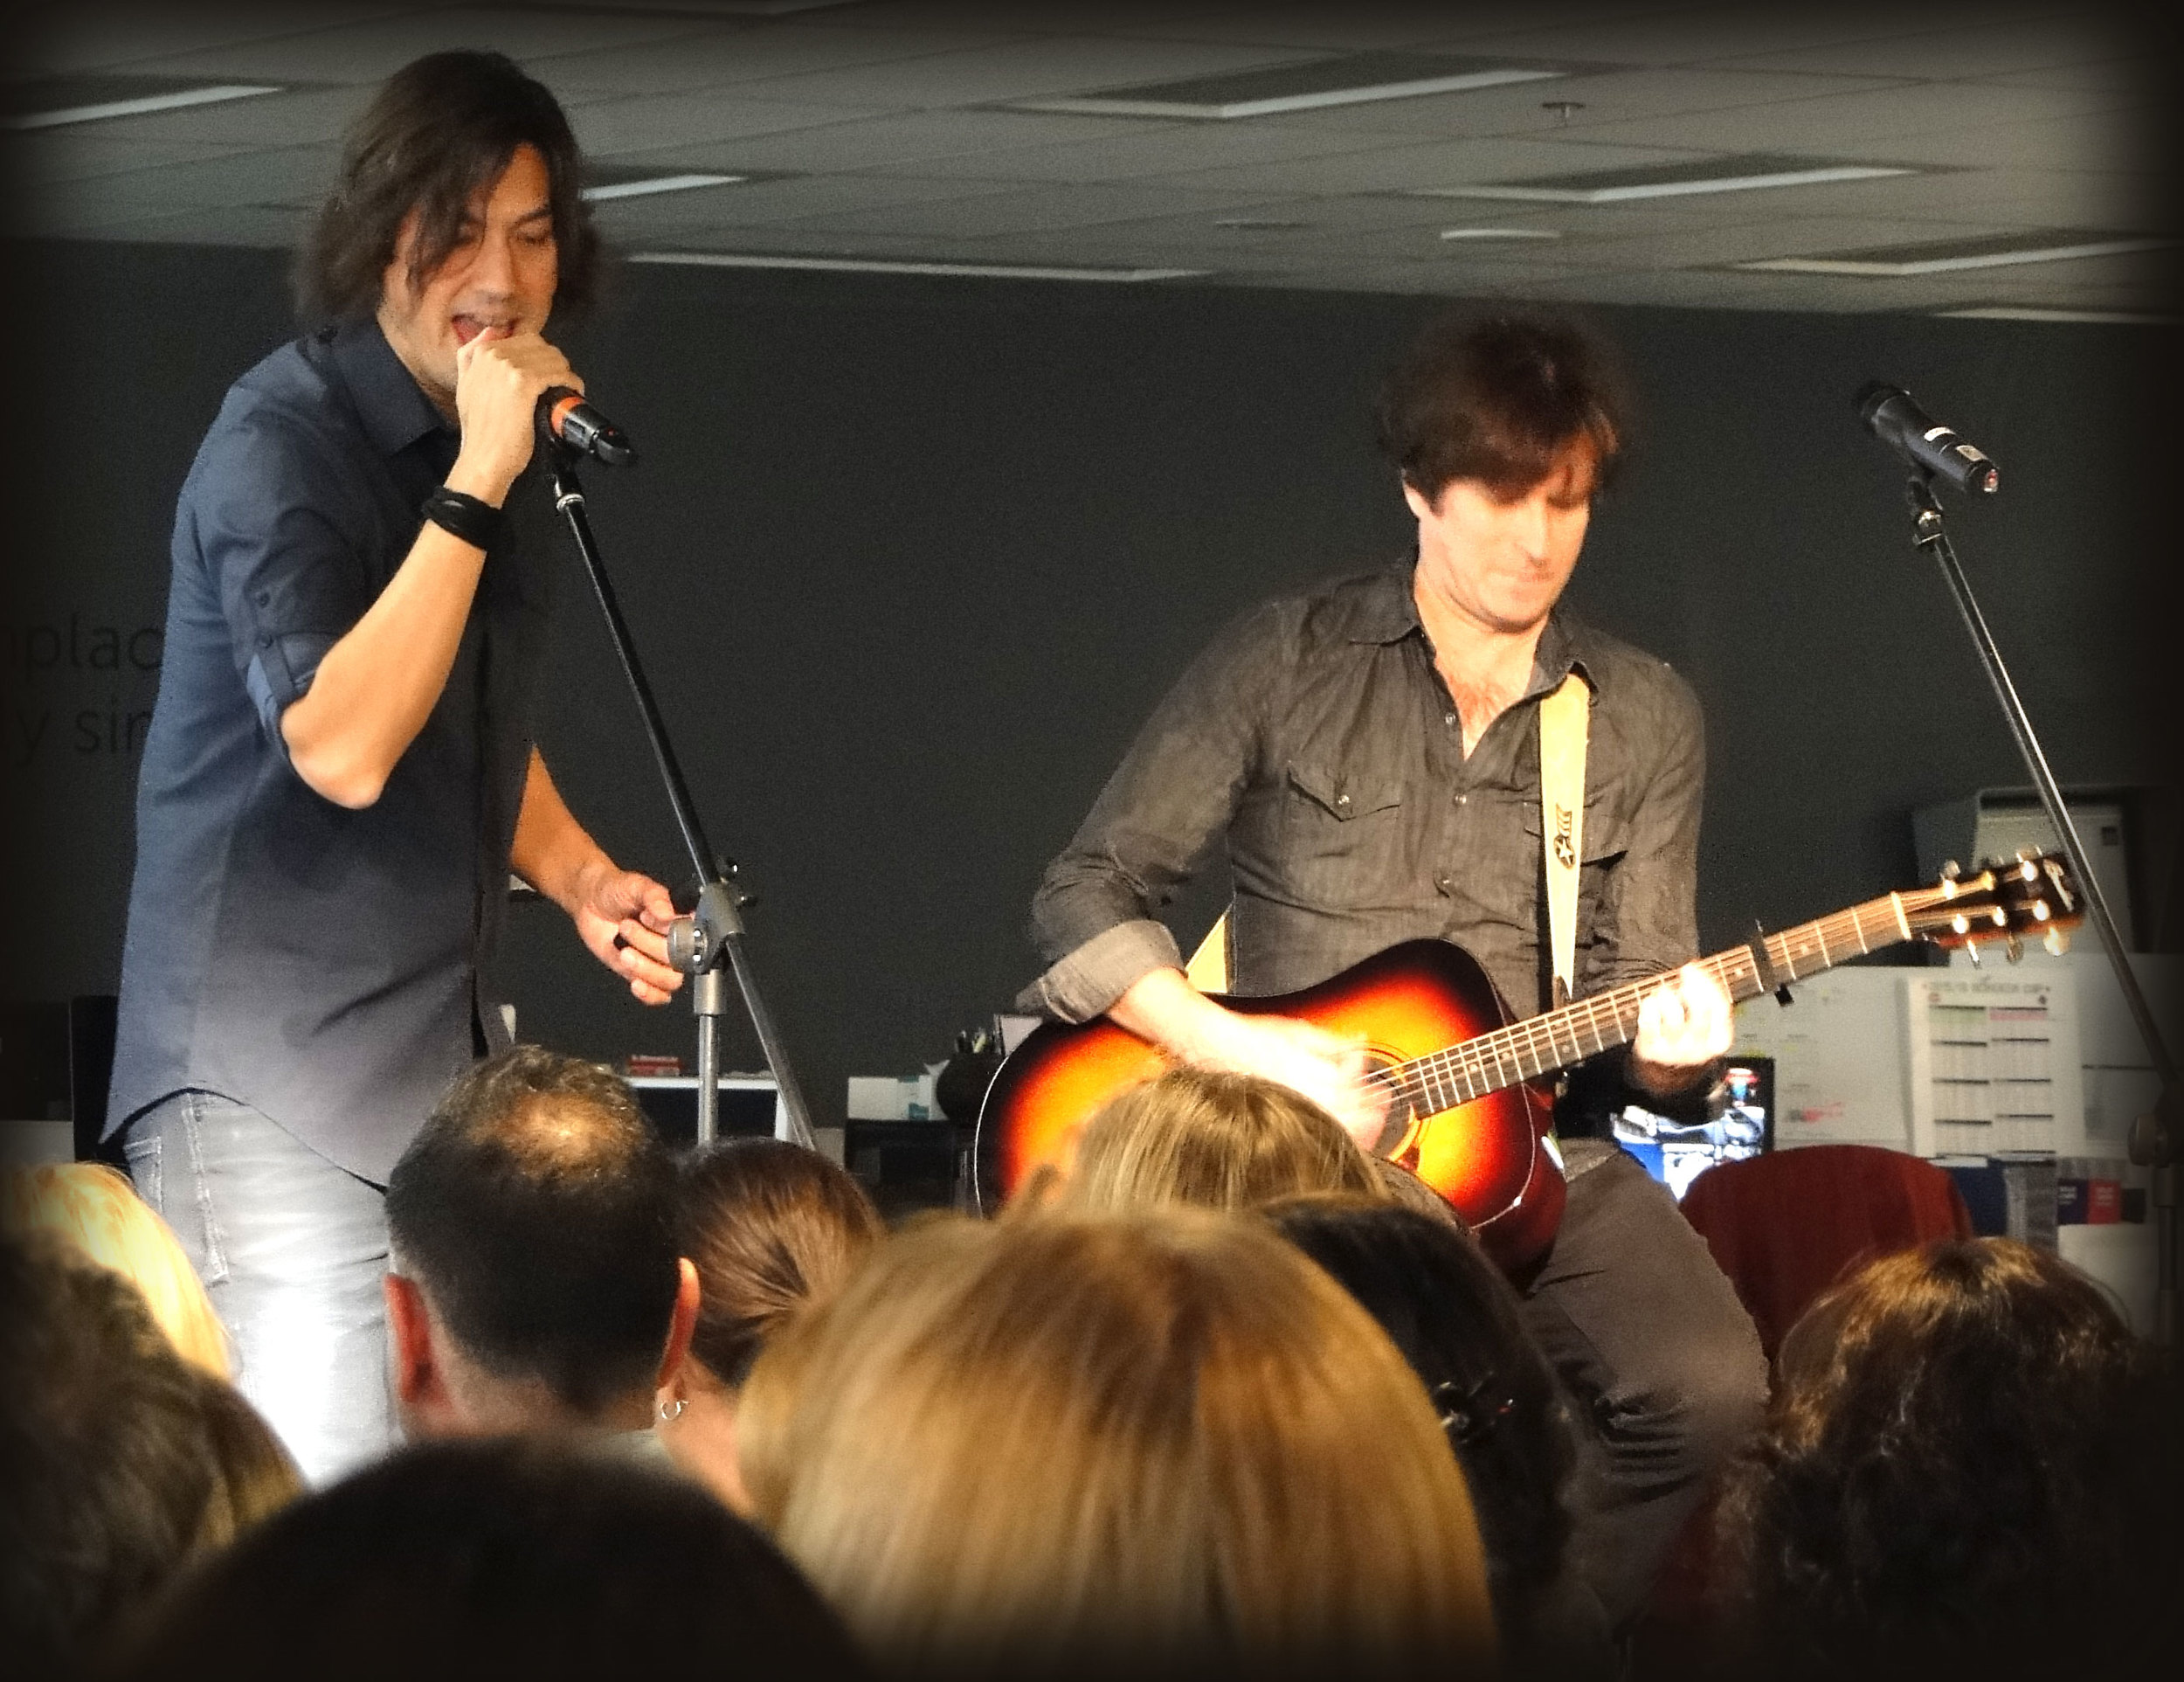 David Usher with Jonathan Gallivan, Guitarist